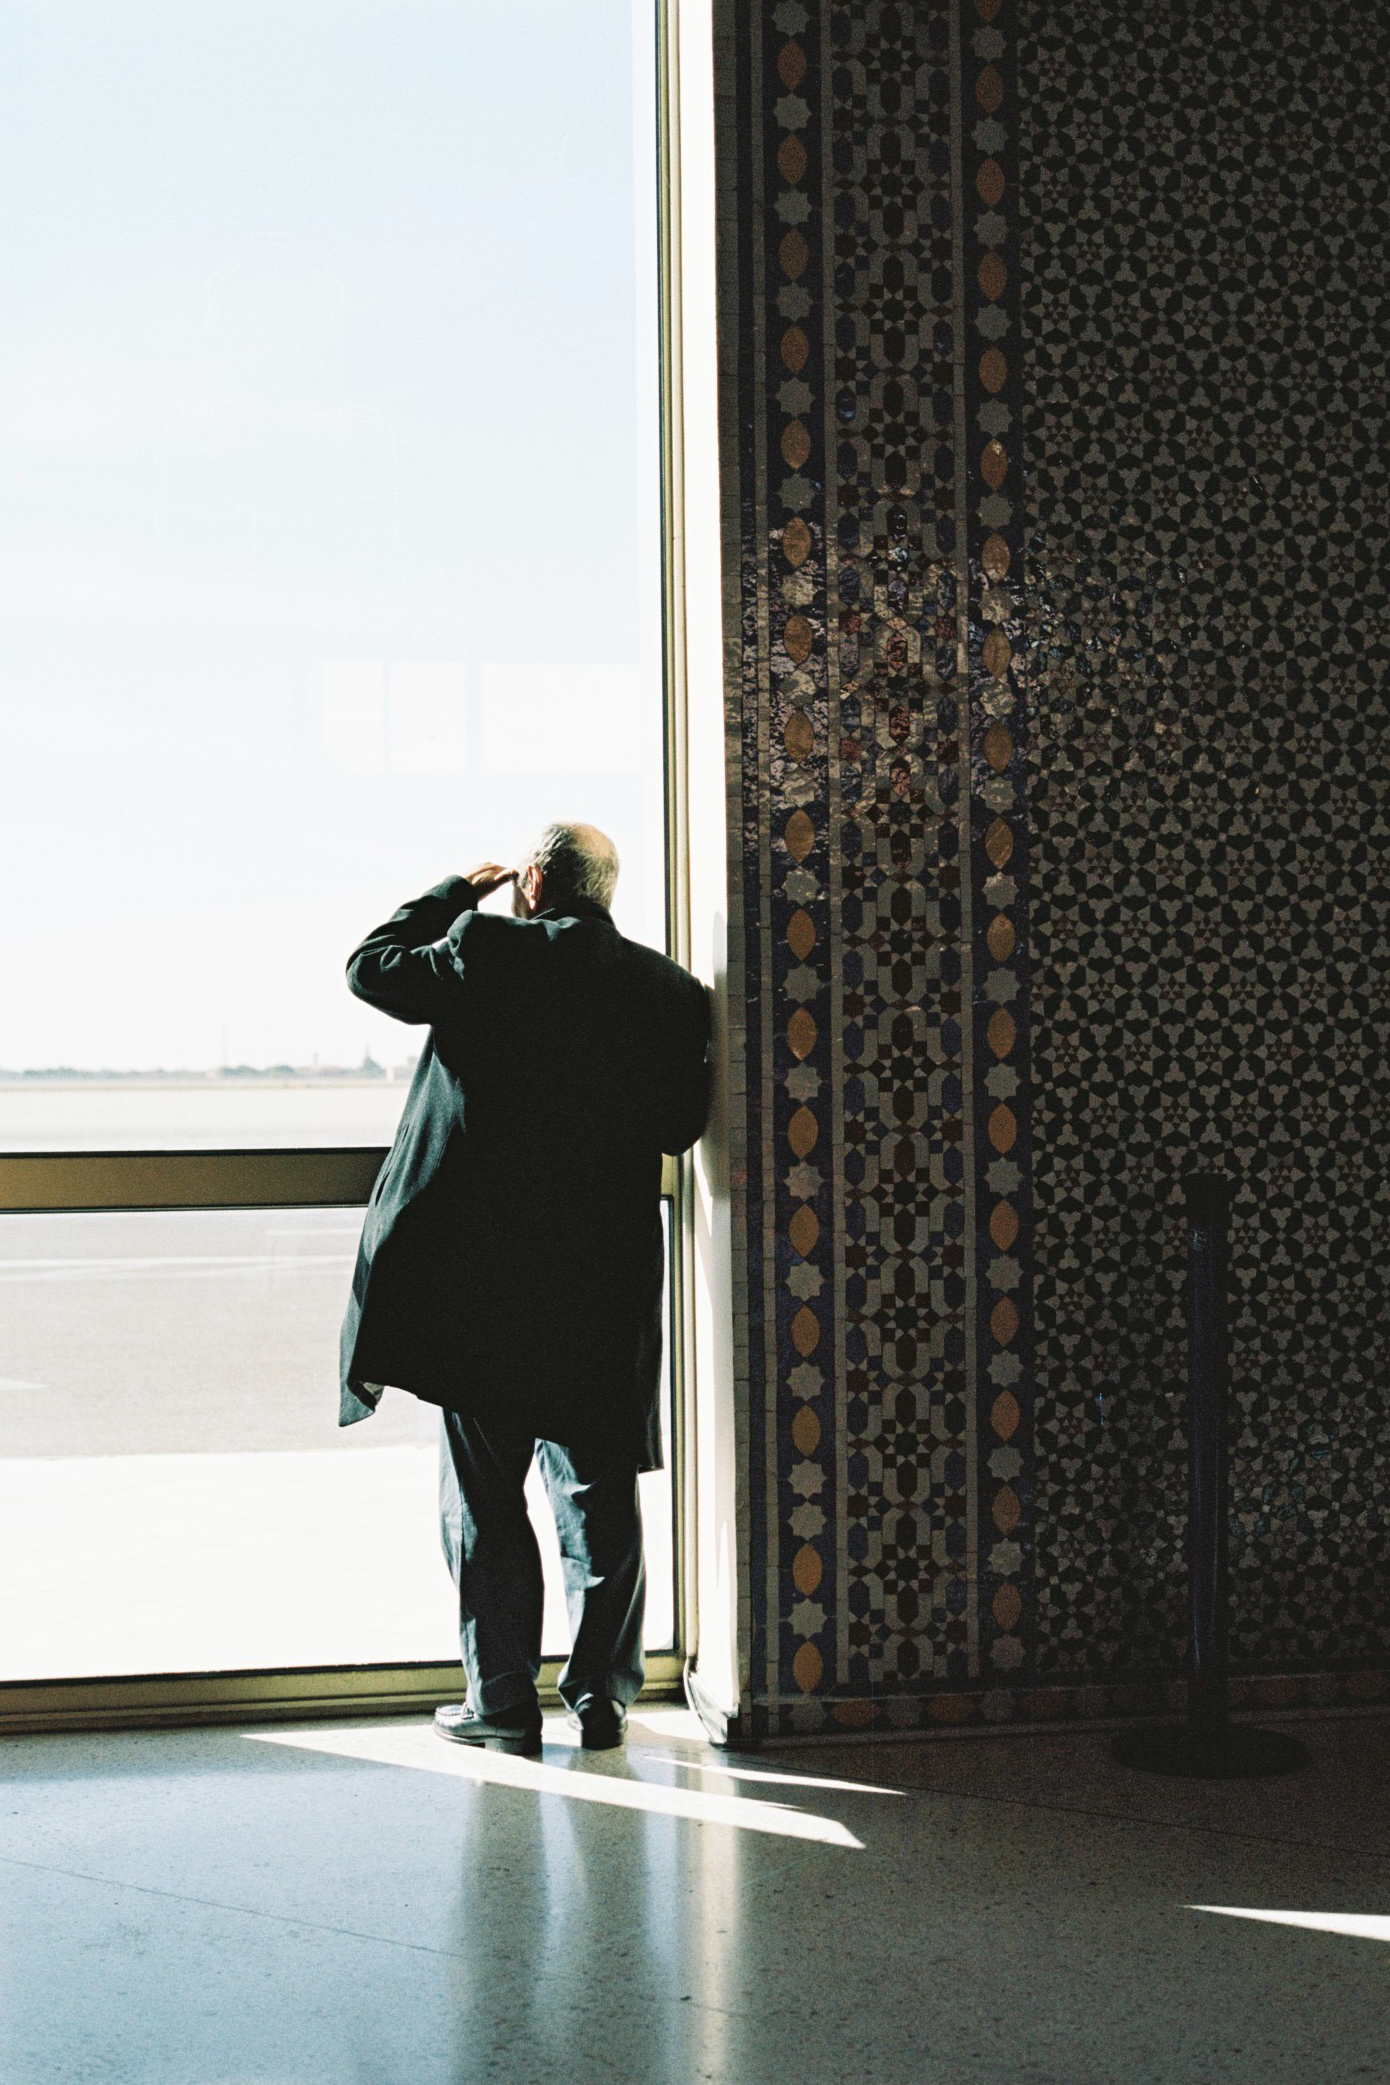 Morocco-Waiting-Photo-Series-000033.jpg